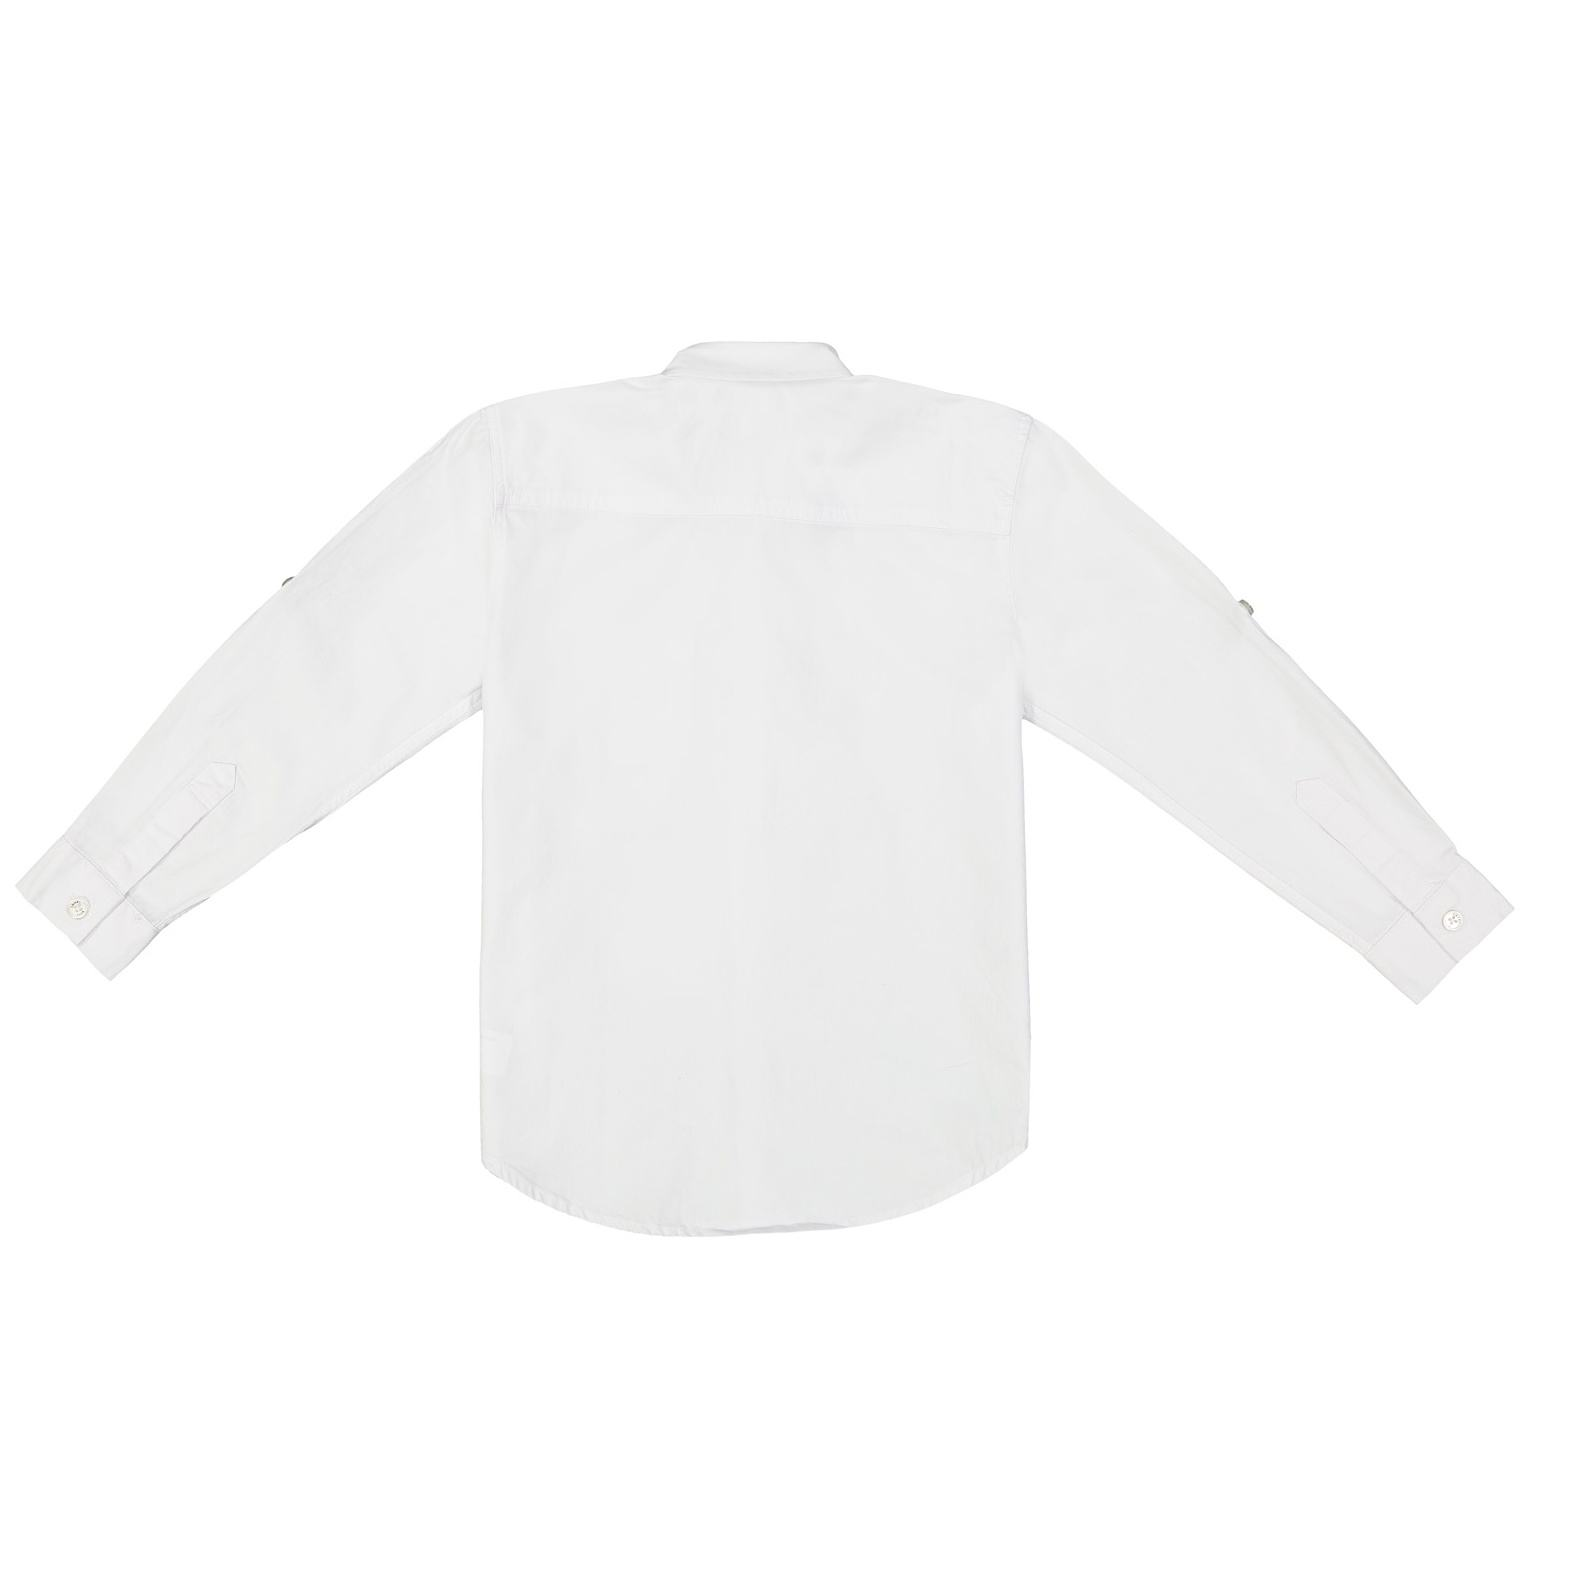 پیراهن پسرانه ال سی وایکیکی مدل 9SN358D4-JYX main 1 2